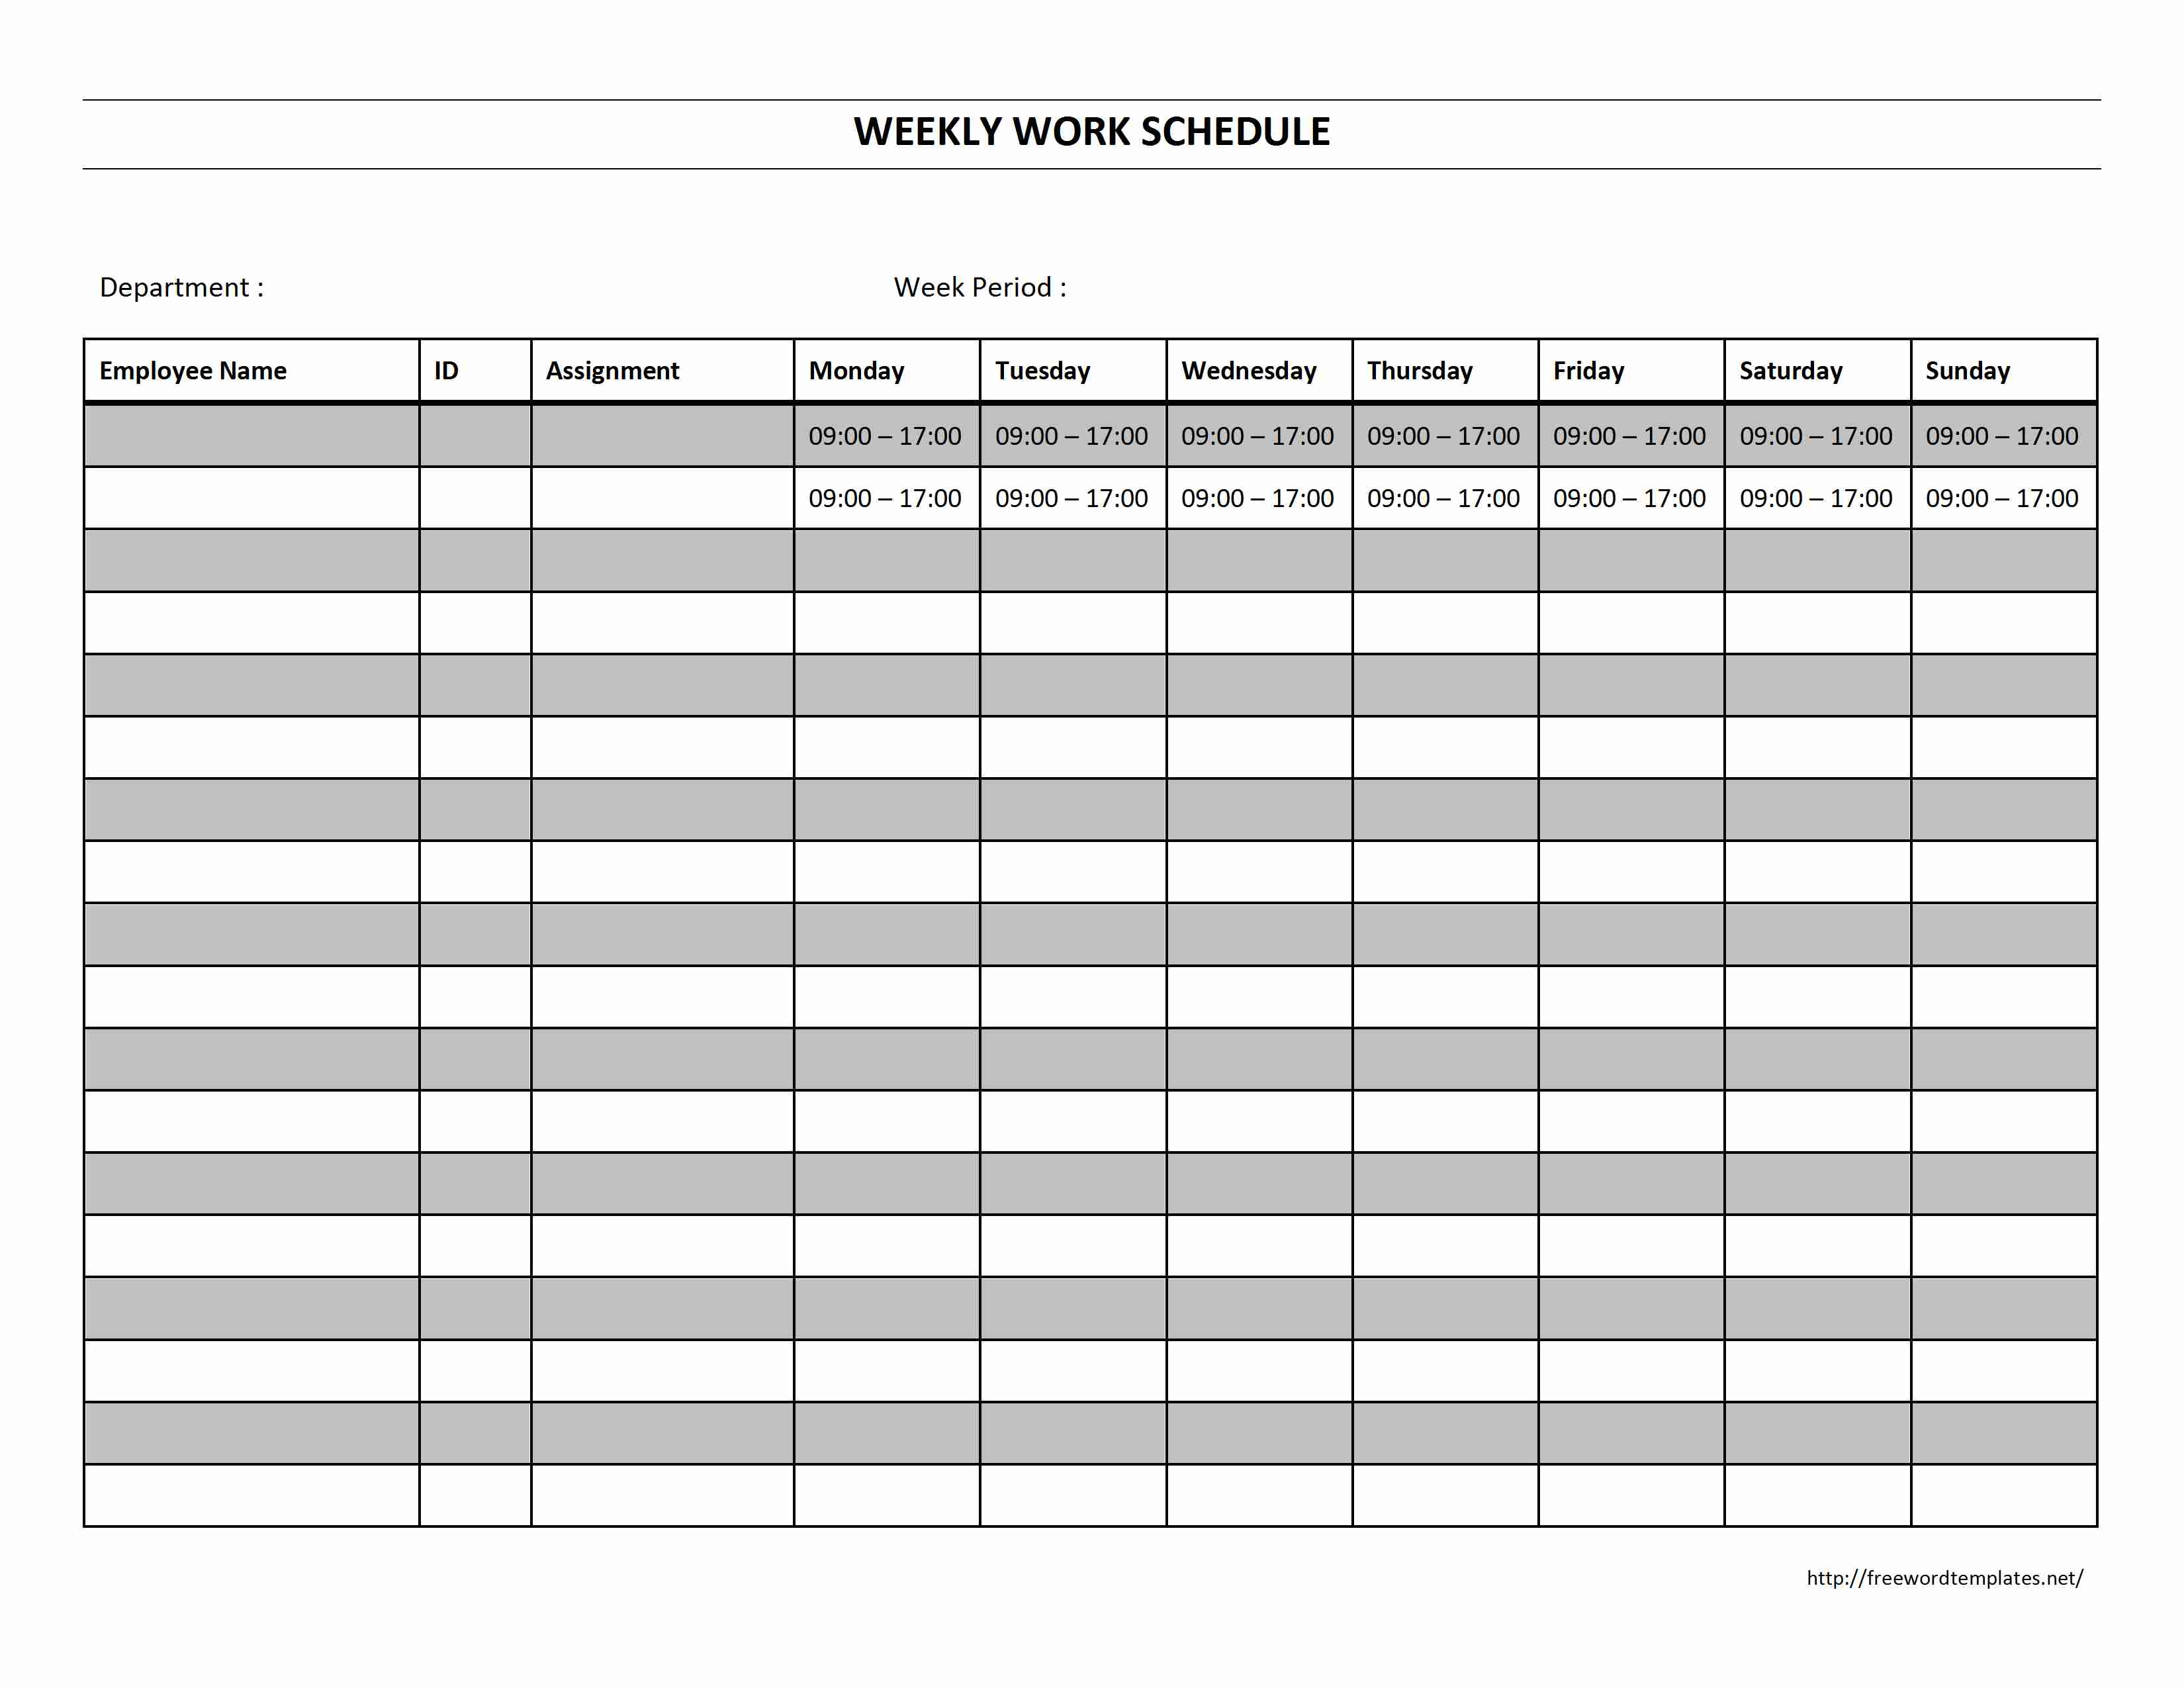 Weekly Work Schedule - Free Printable Monthly Work Schedule Template